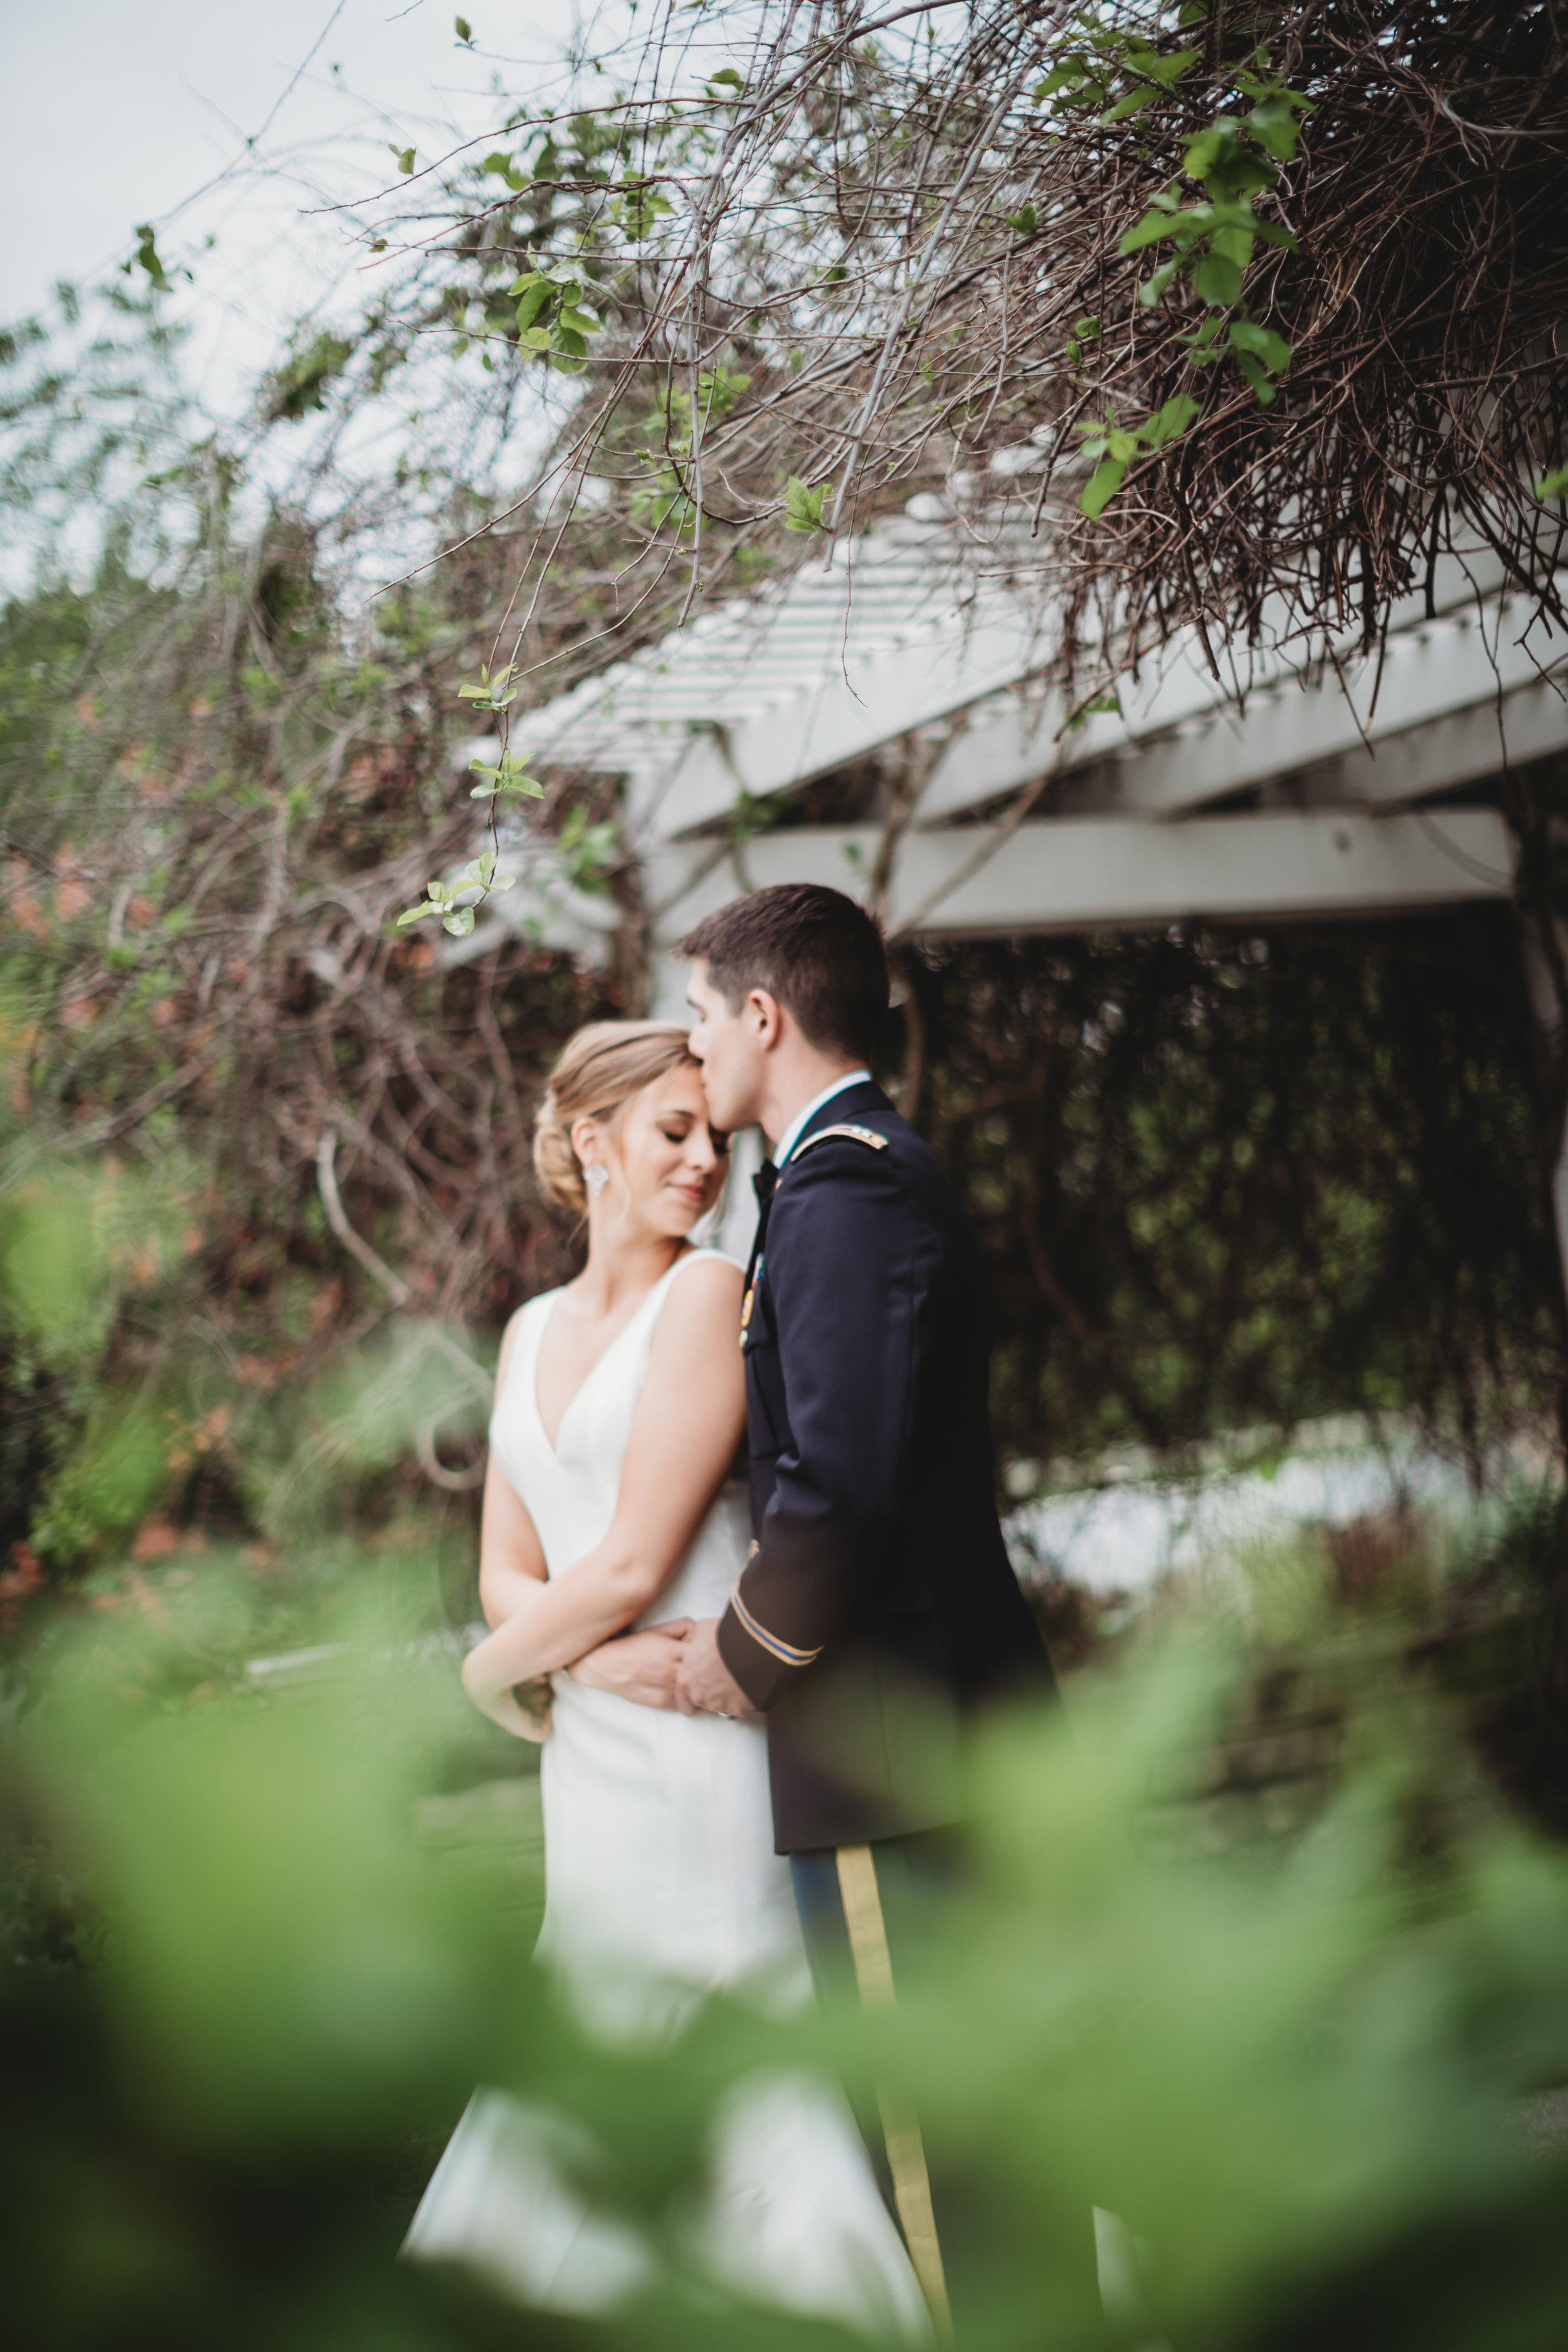 Centennial-Park-Munster-indiana-bride-and-groom-Lauren-ashley-studios.jpg